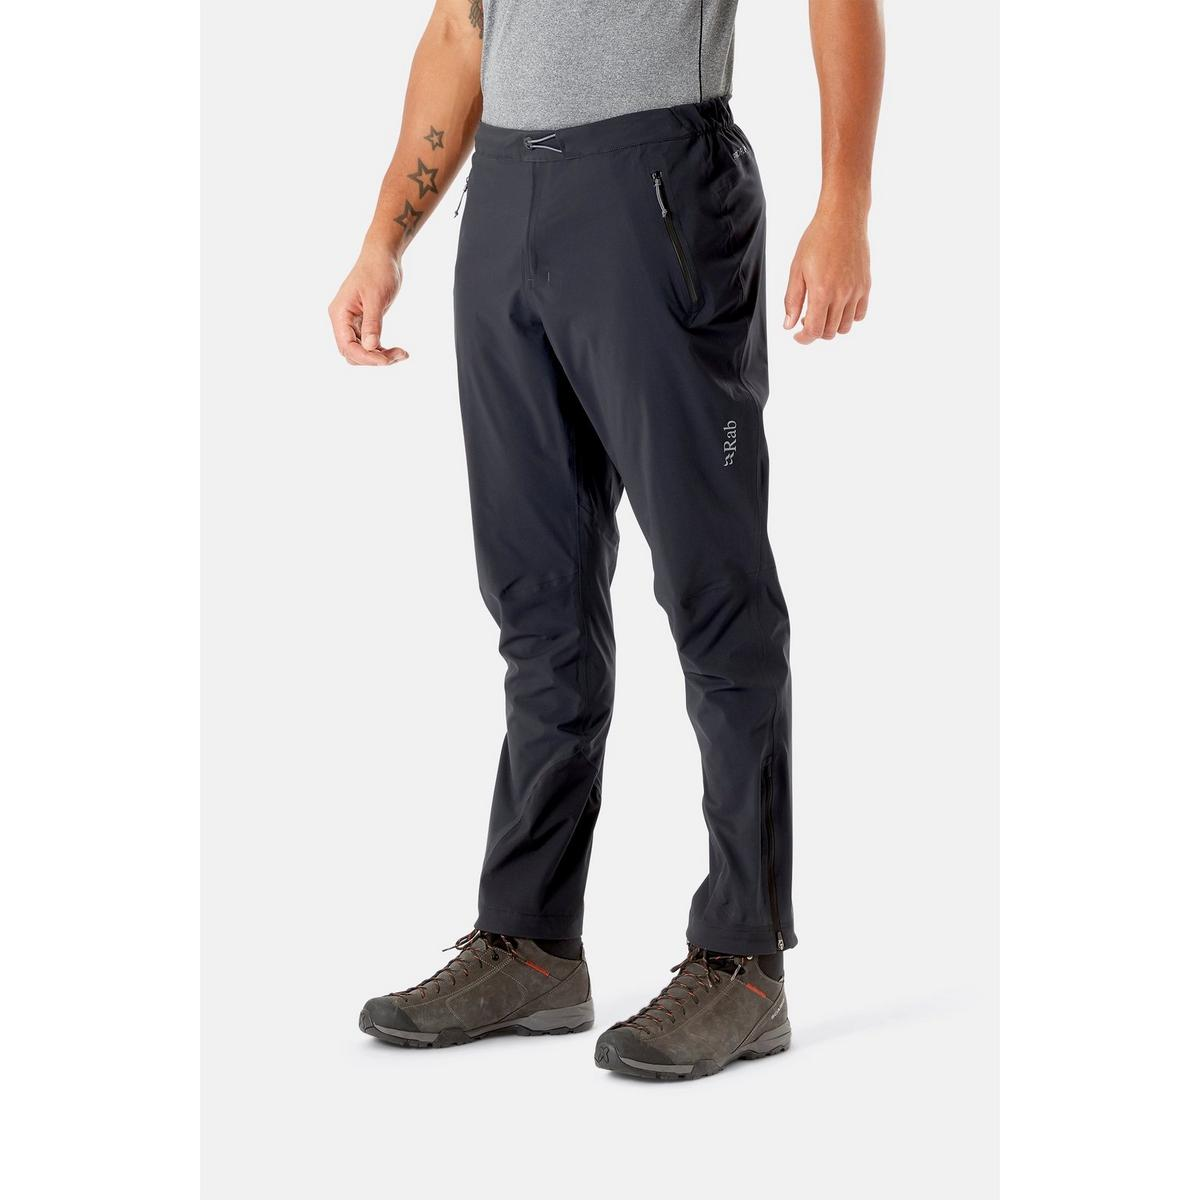 Rab Men's Kinetic 2.0 Pant - Grey